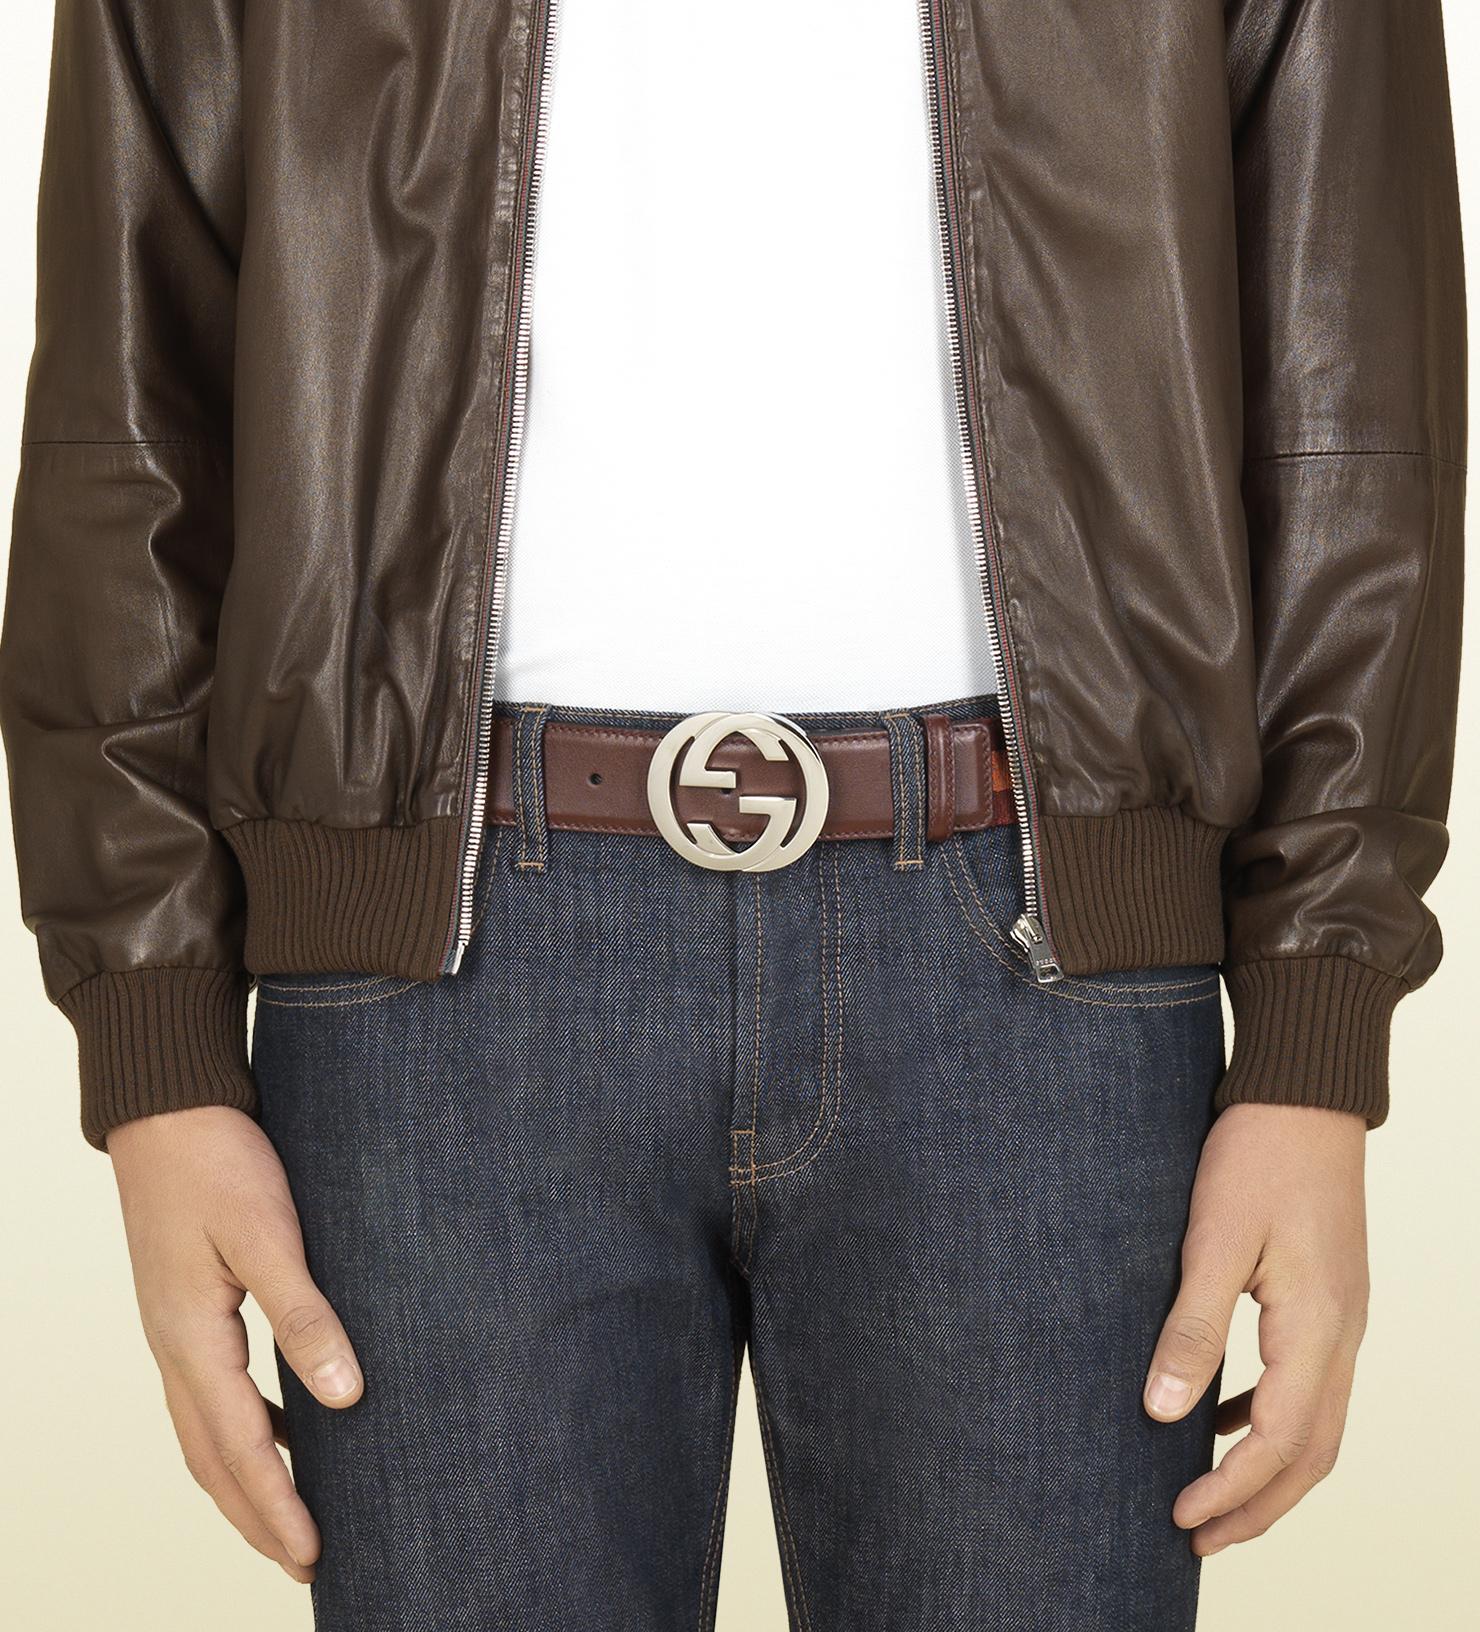 058d72d08a5af Lyst - Gucci Belt with Interlocking G Buckle in Brown for Men